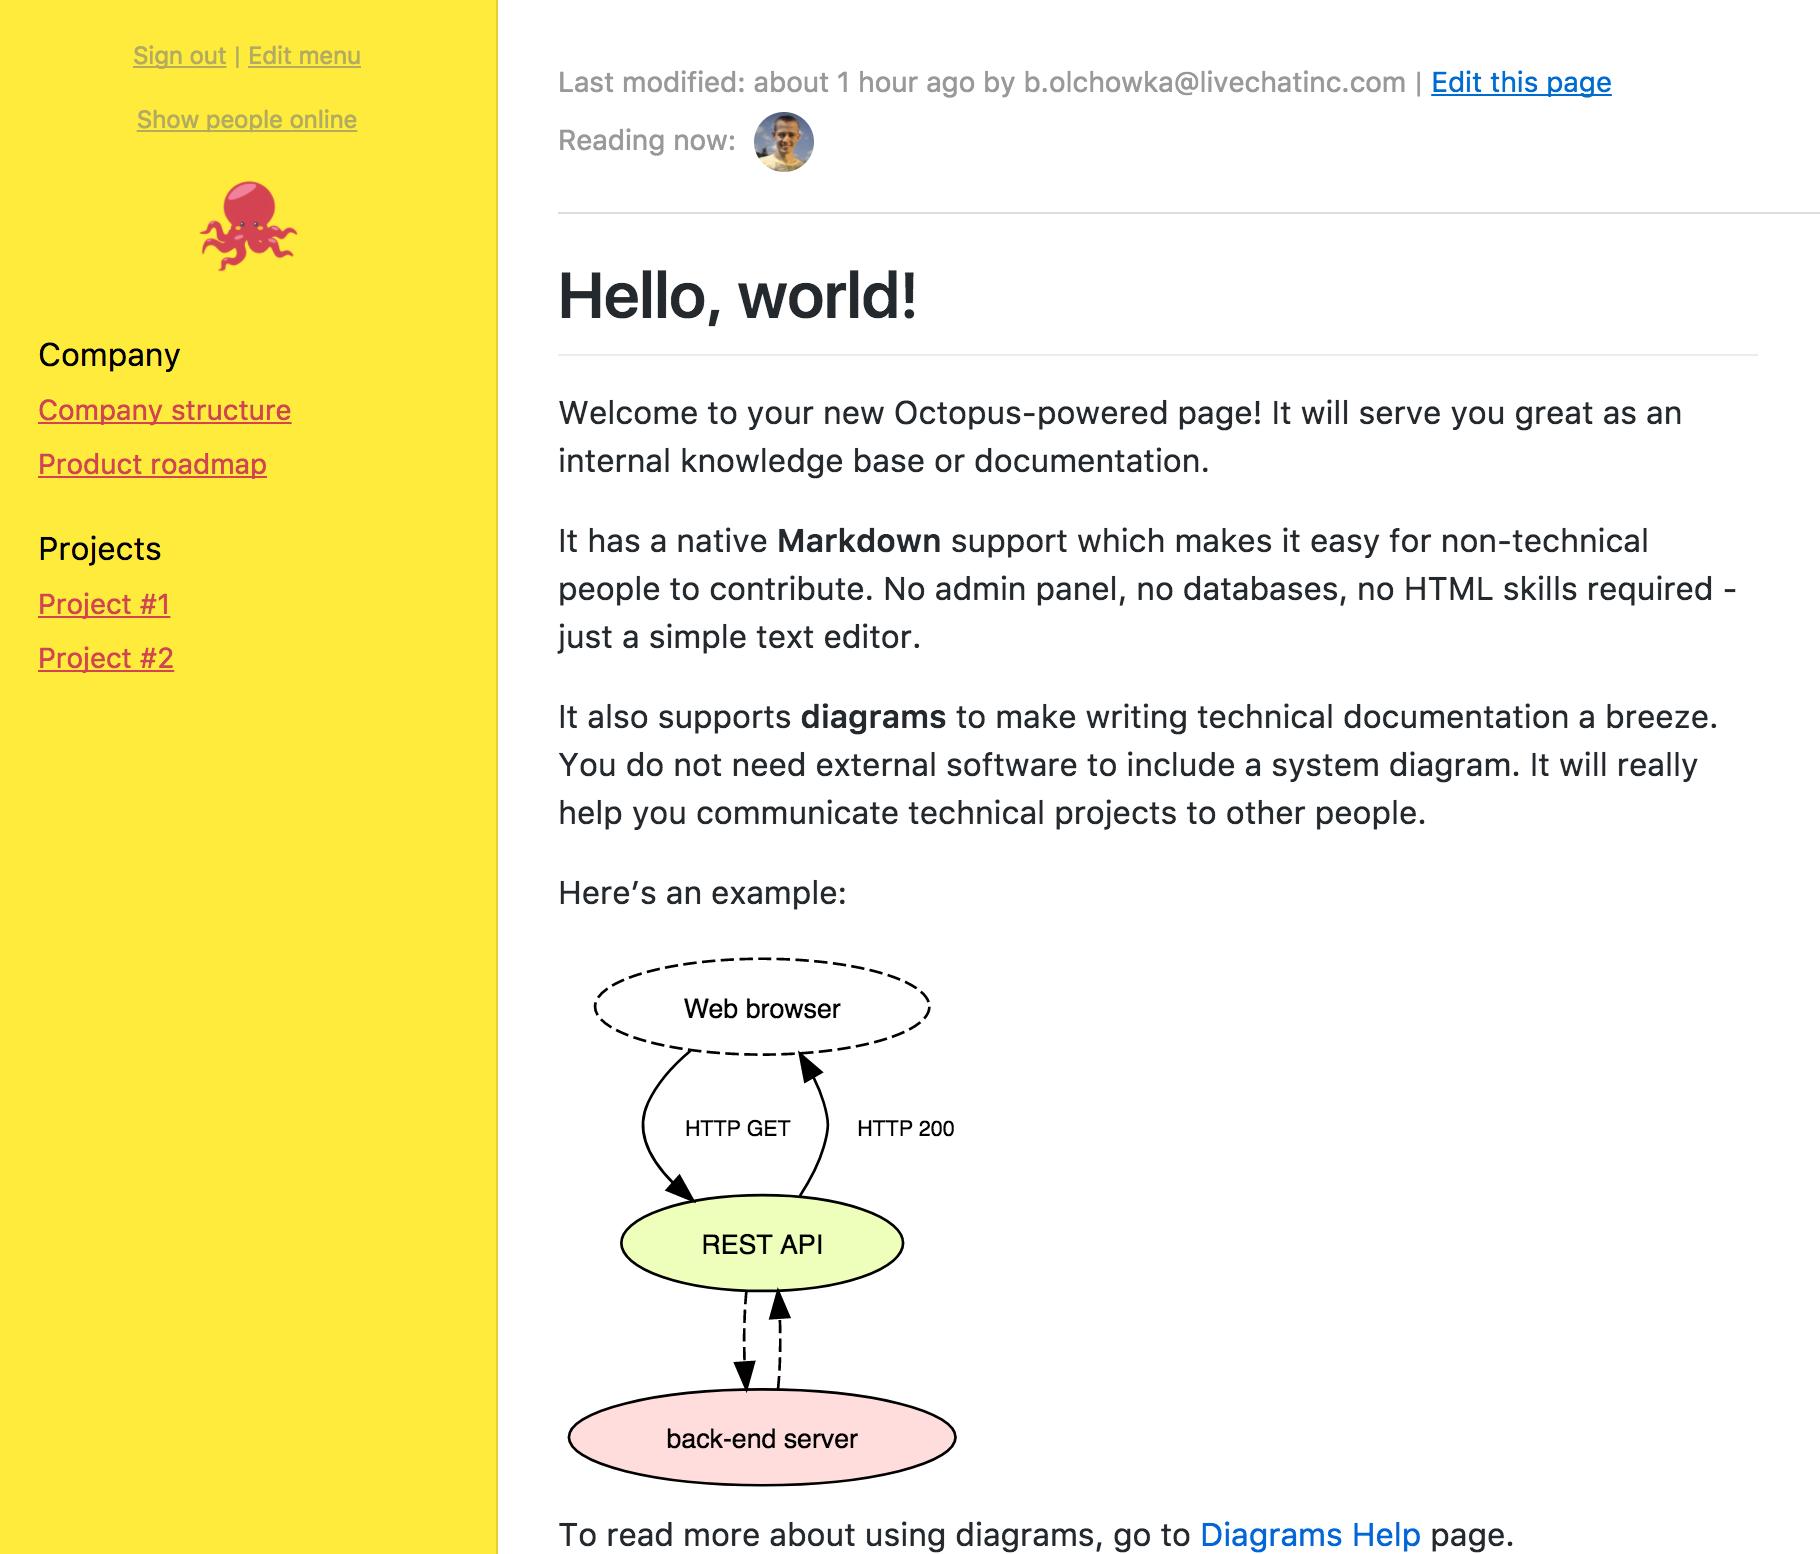 LiveChat for Developers Blog - Meet Octopus - Internal Wiki